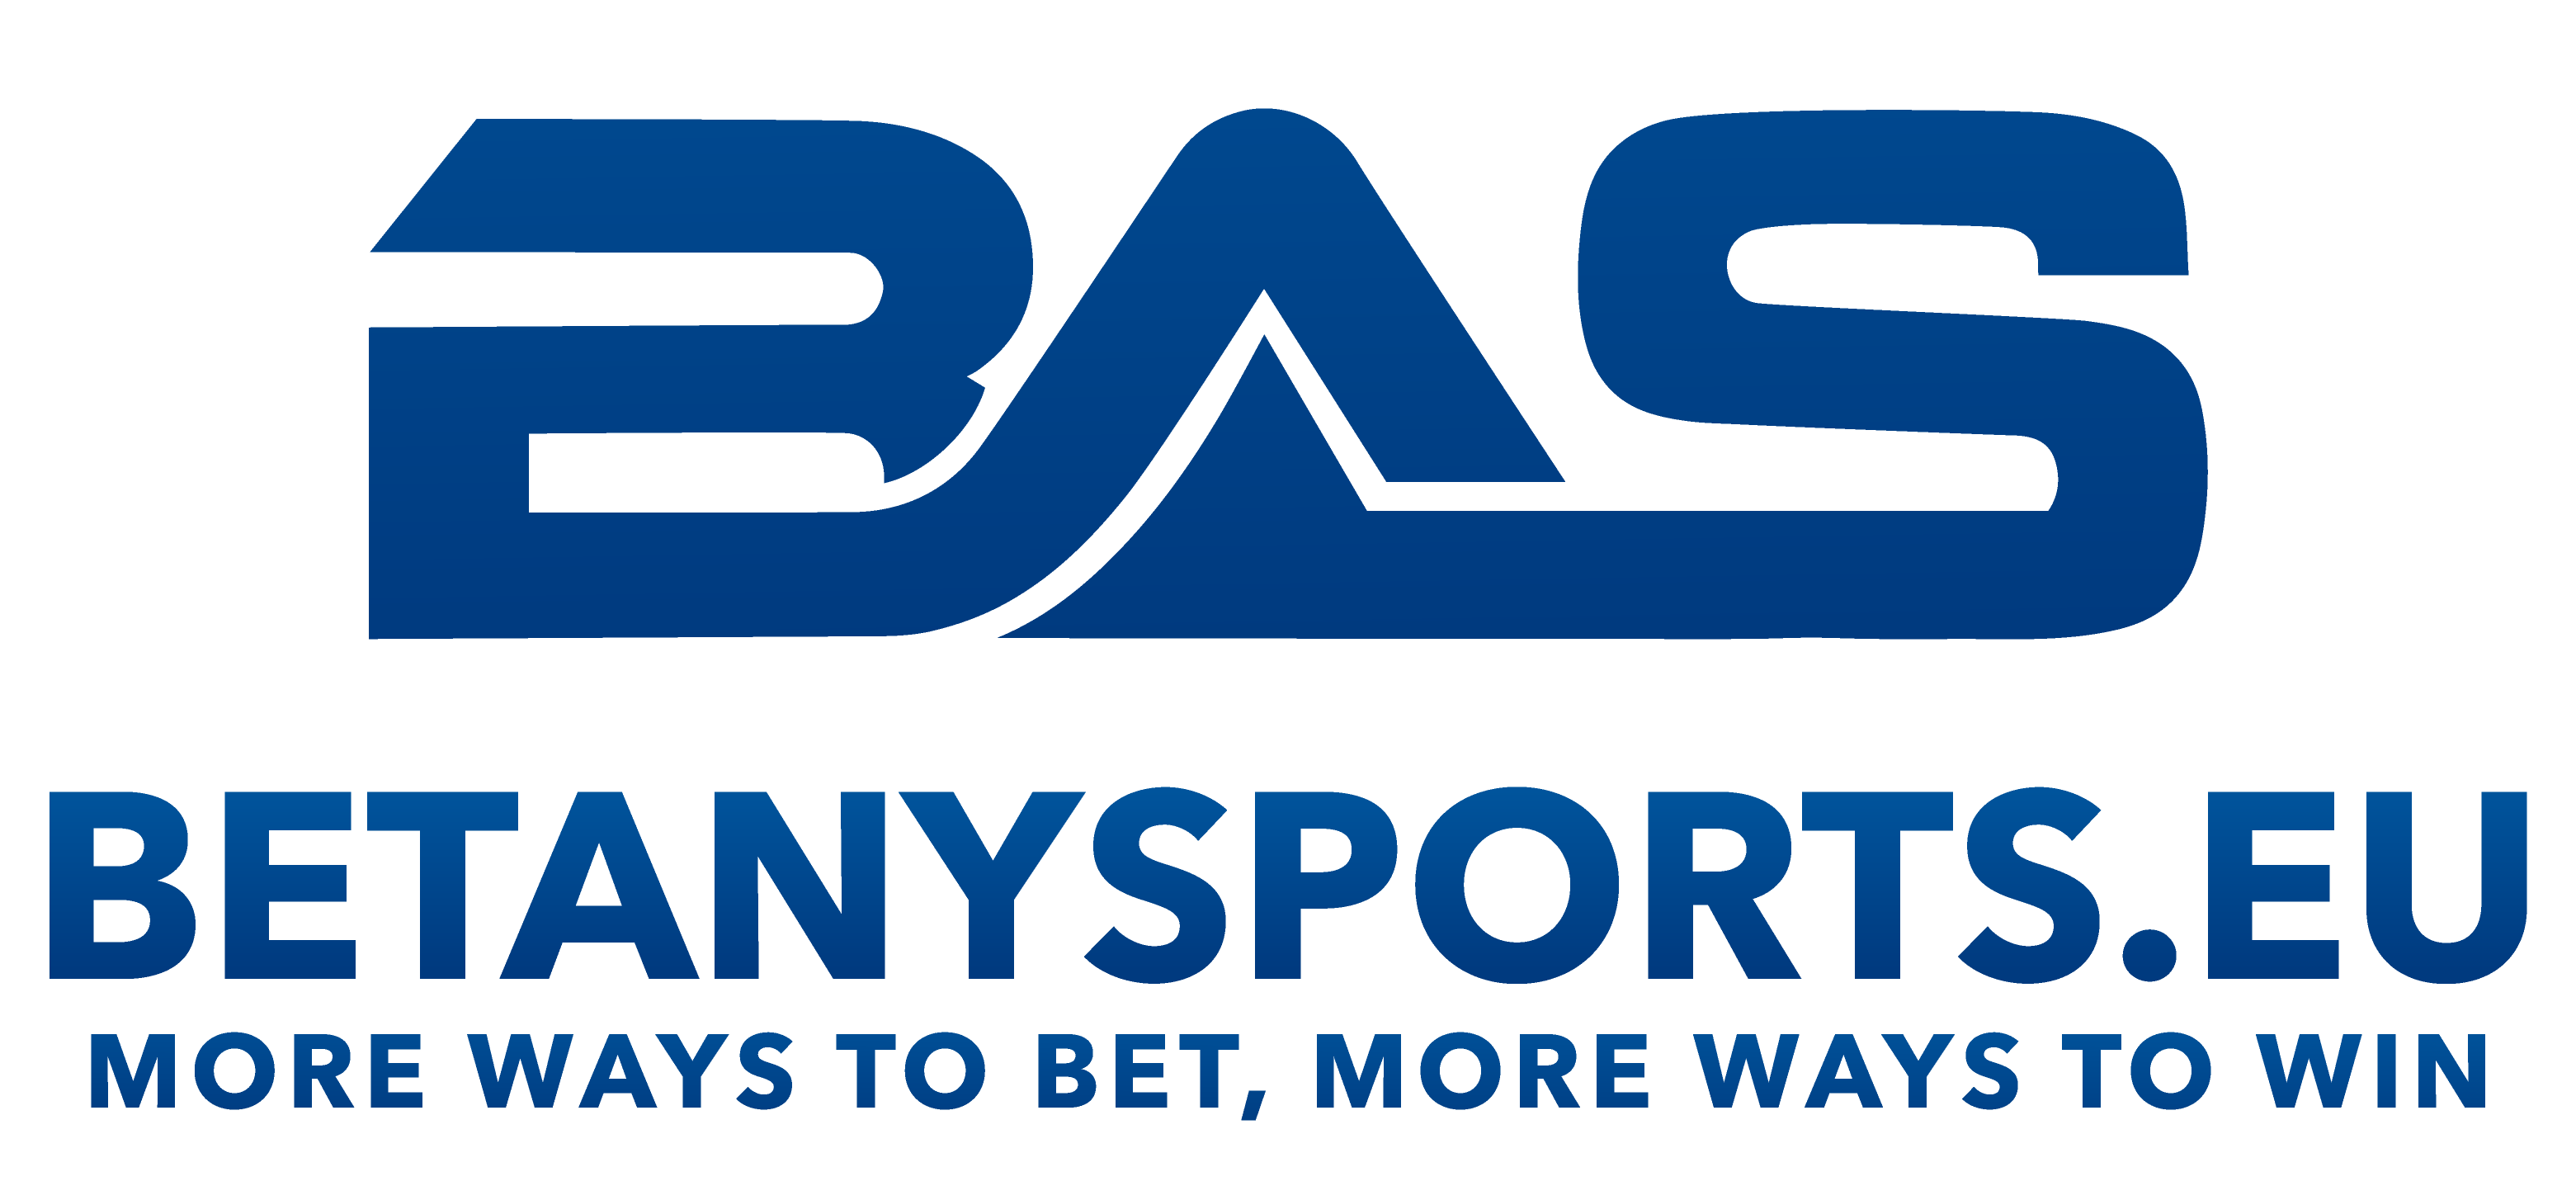 #3 BetAnySports Sportsbook